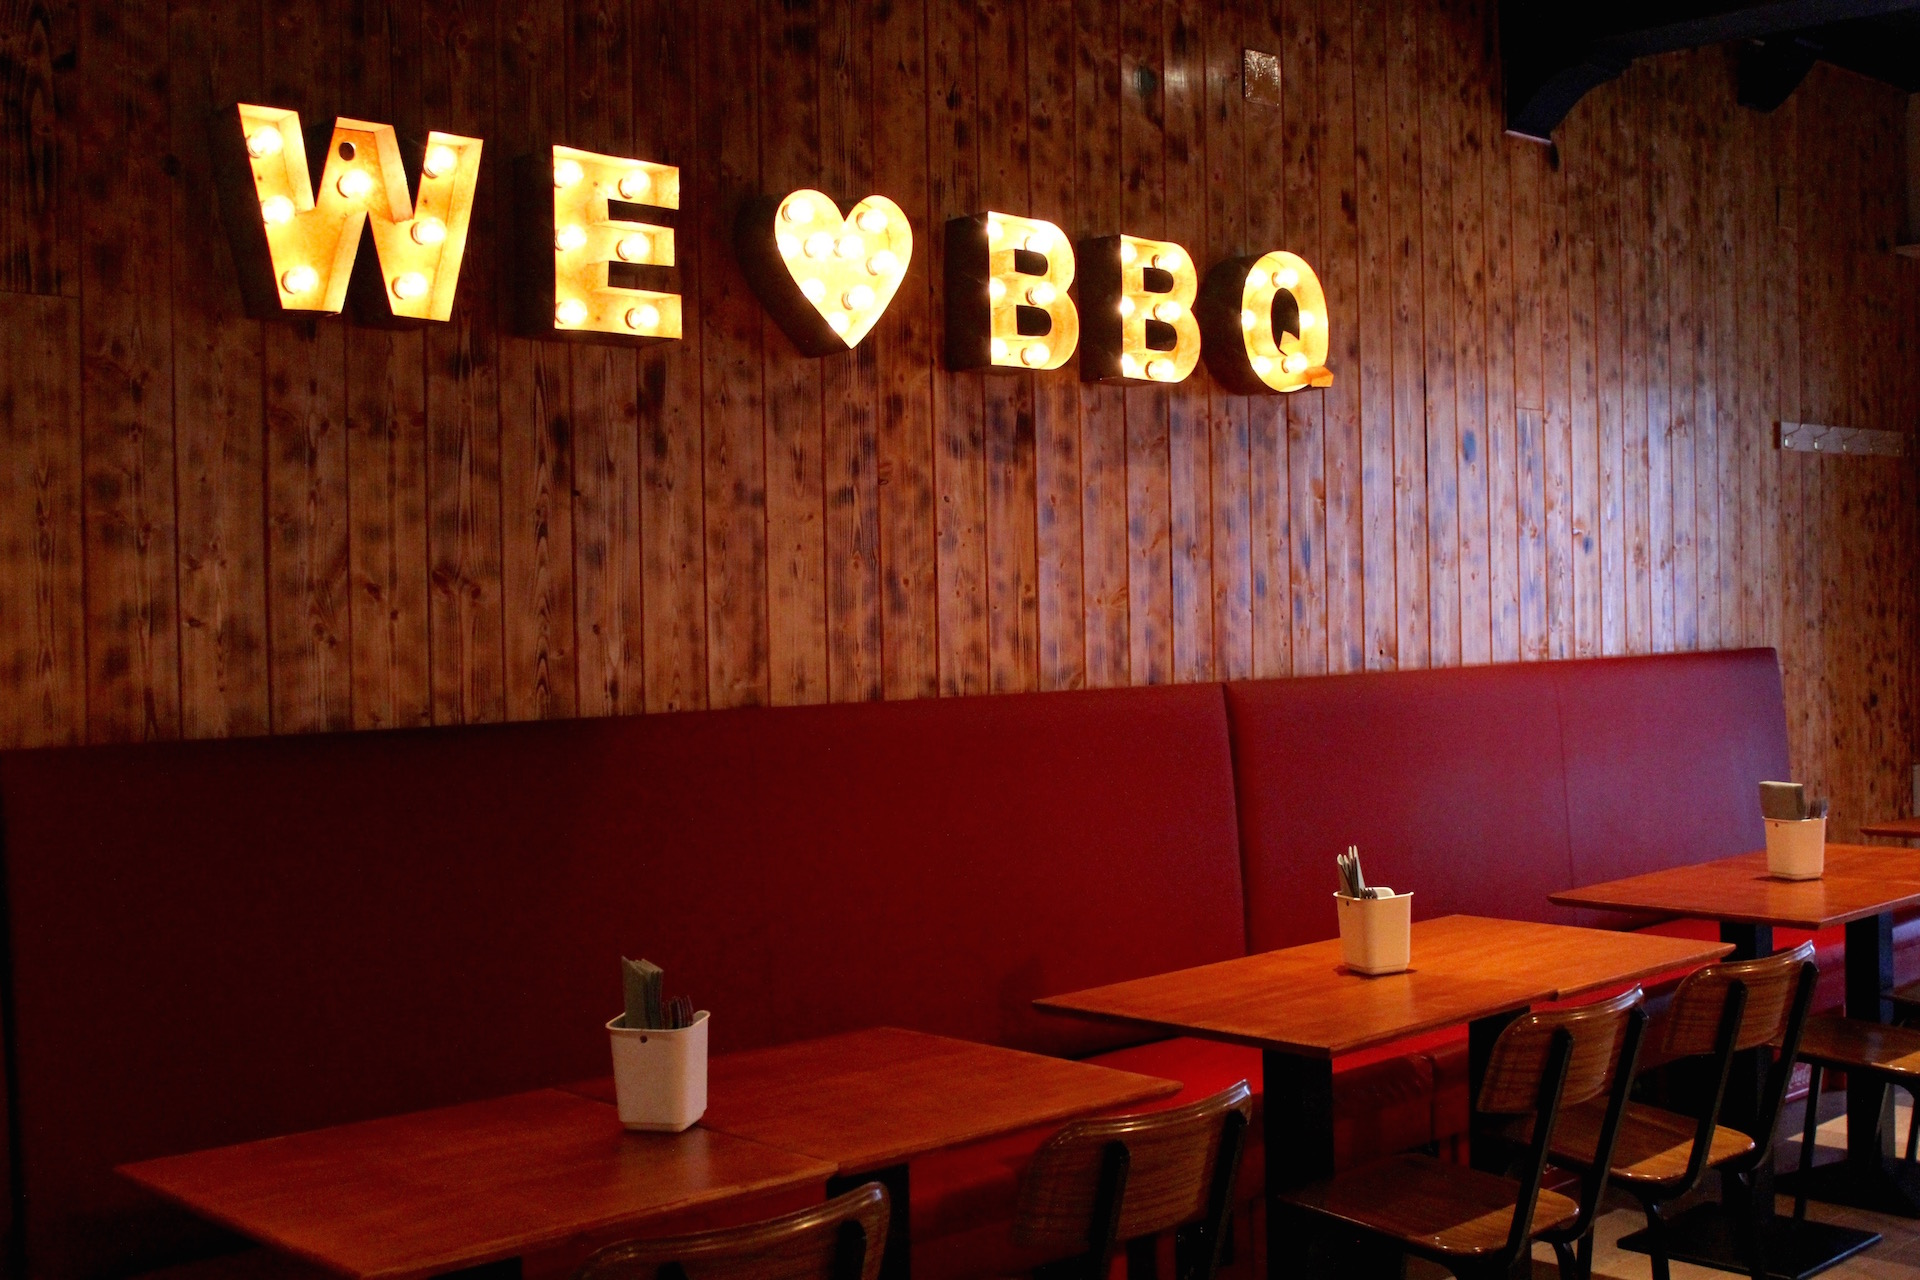 We love BBQ